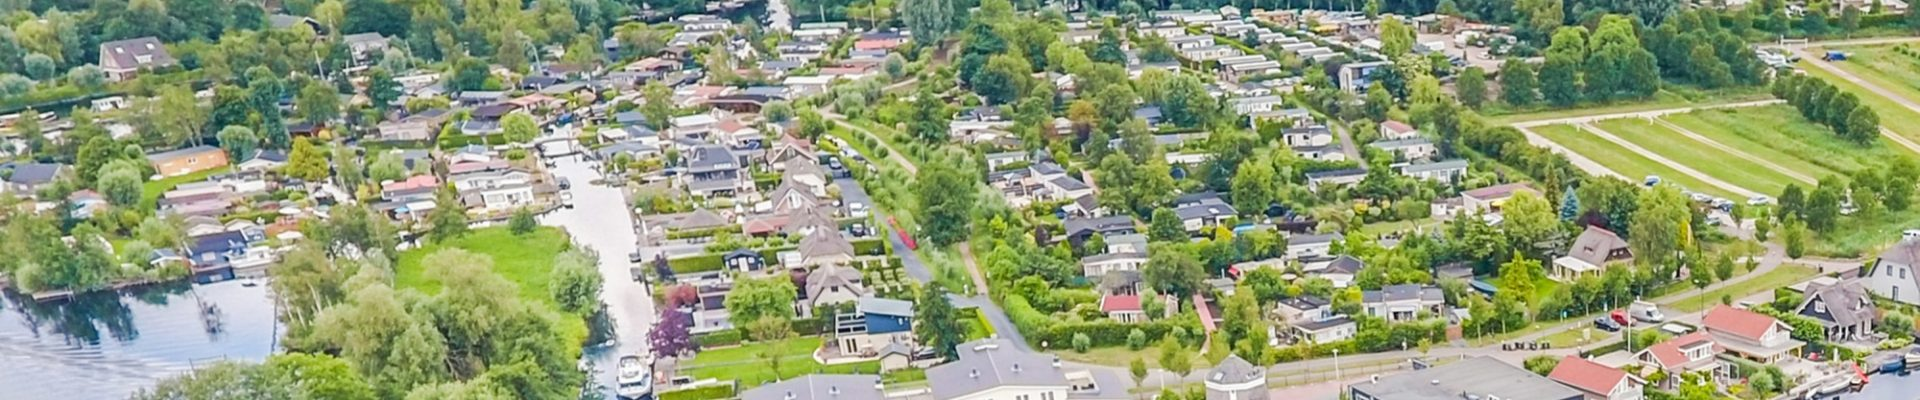 Kadaster Drone Fotografie 8